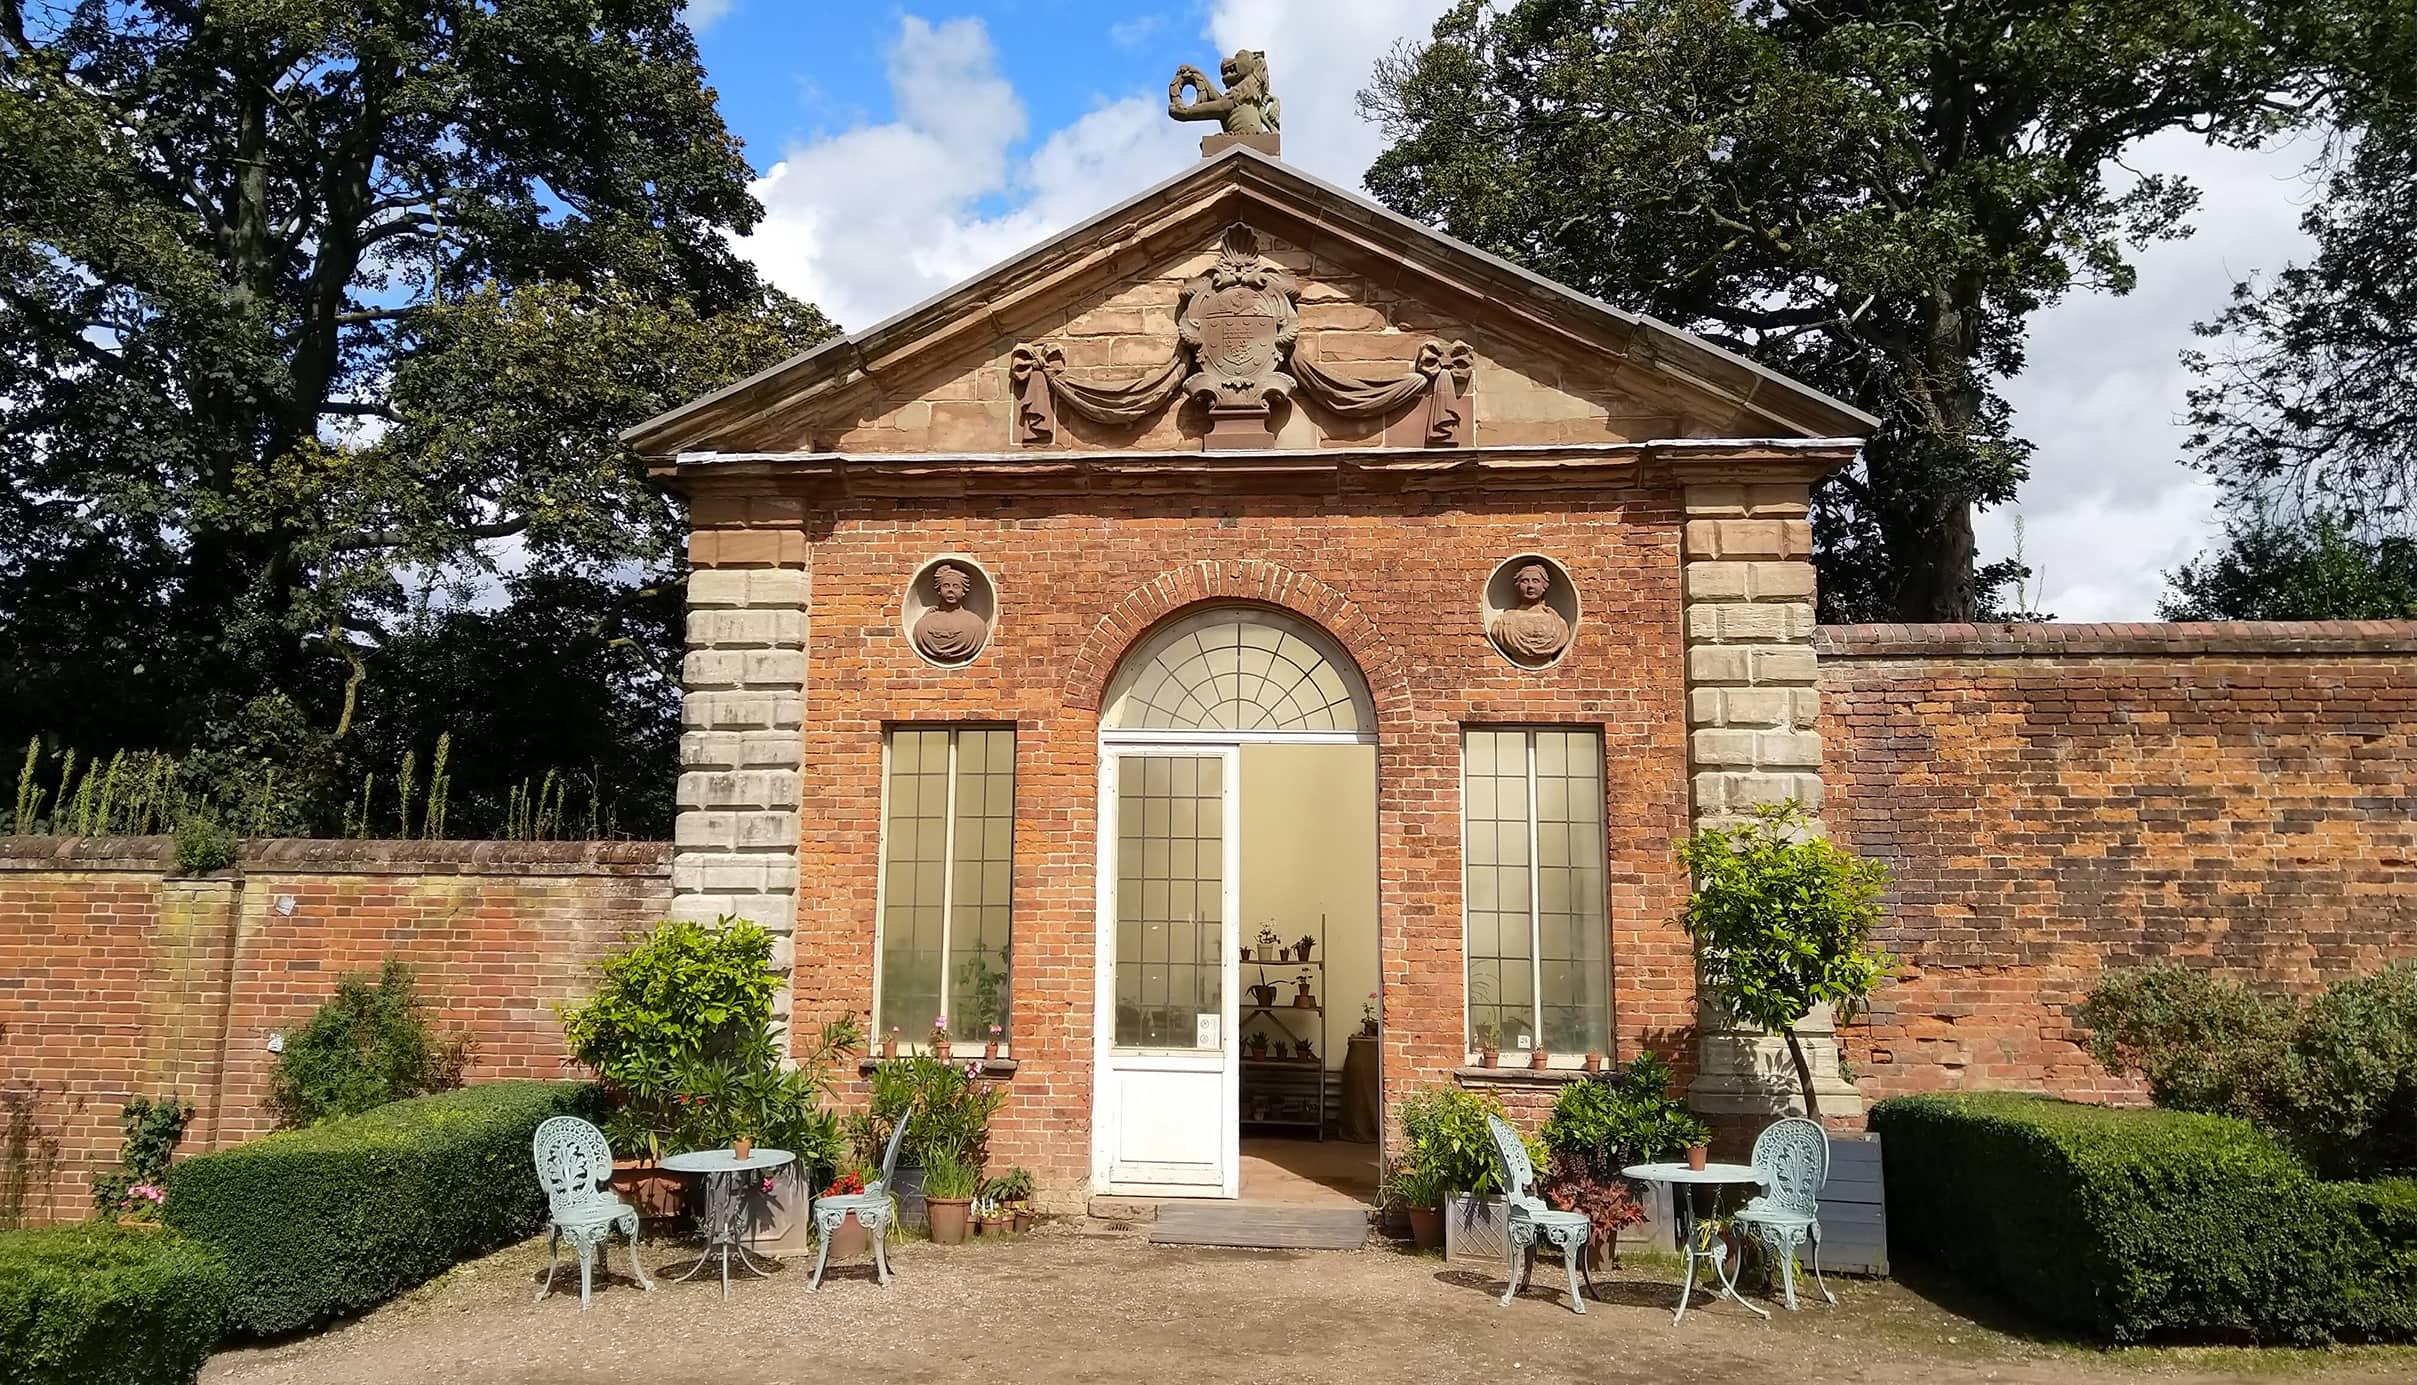 castle-bromwich-historic-gardens-1160x665